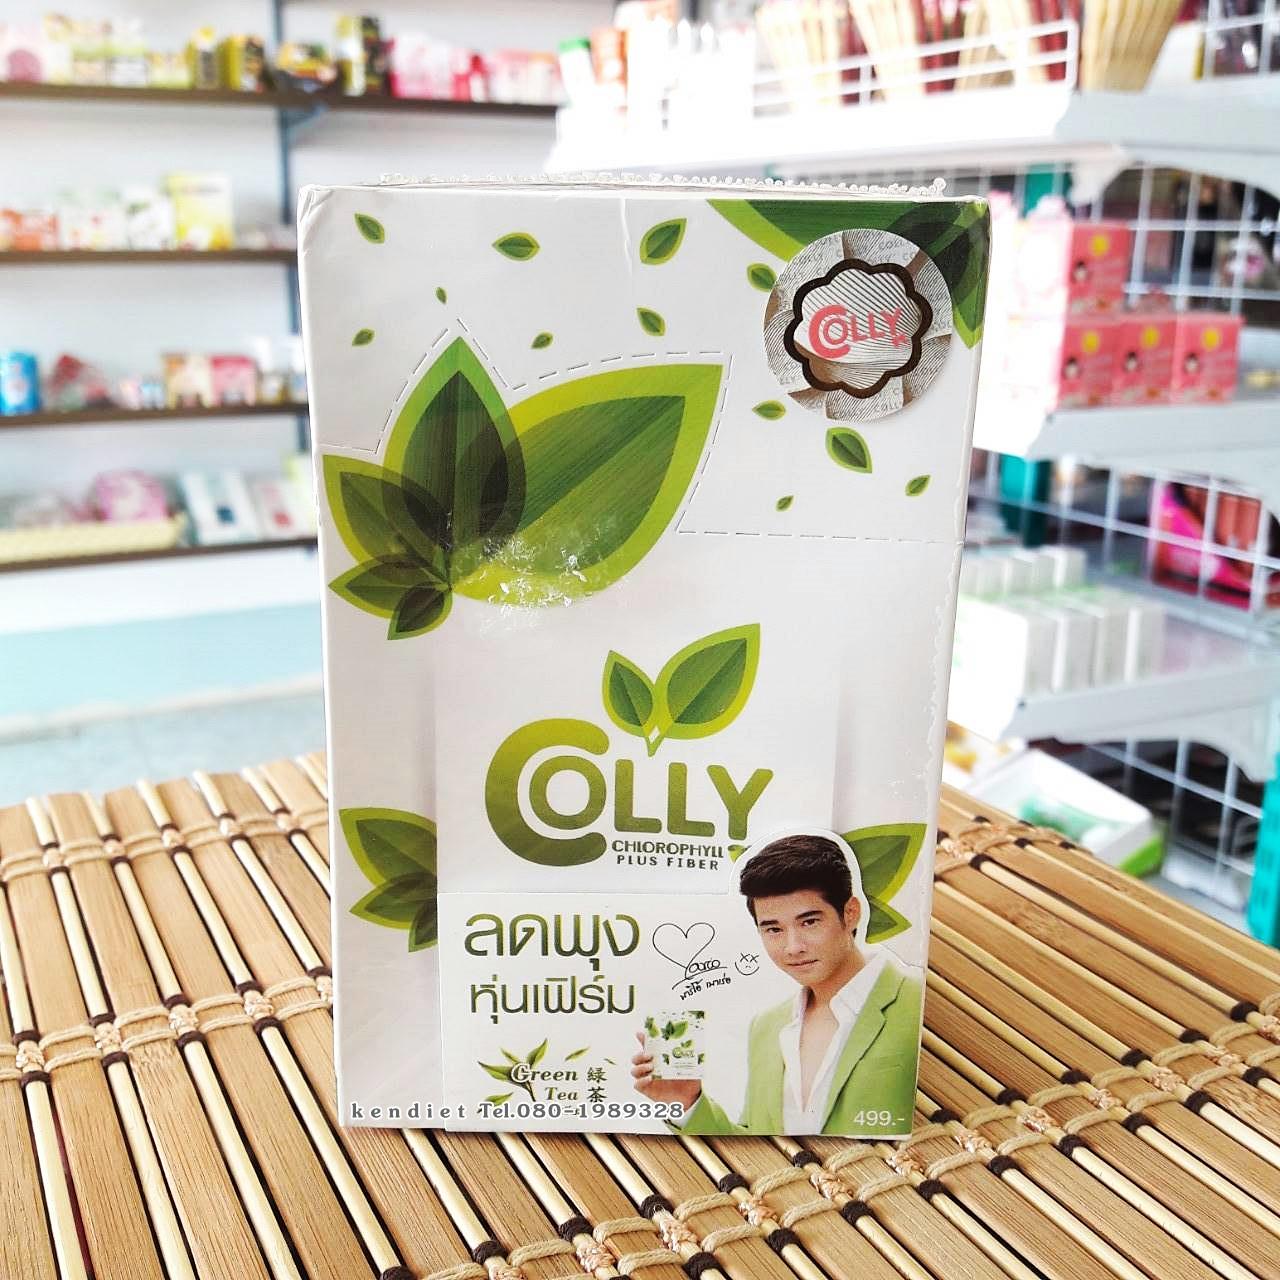 Colly Chlorophyll Plus Fiber คอลลี่ คลอโรฟิลล์ พลัส ไฟเบอร์ สารสกัดคลอโรฟิลล์กลิ่นหอมชาเขียว ล้างสารพิษ